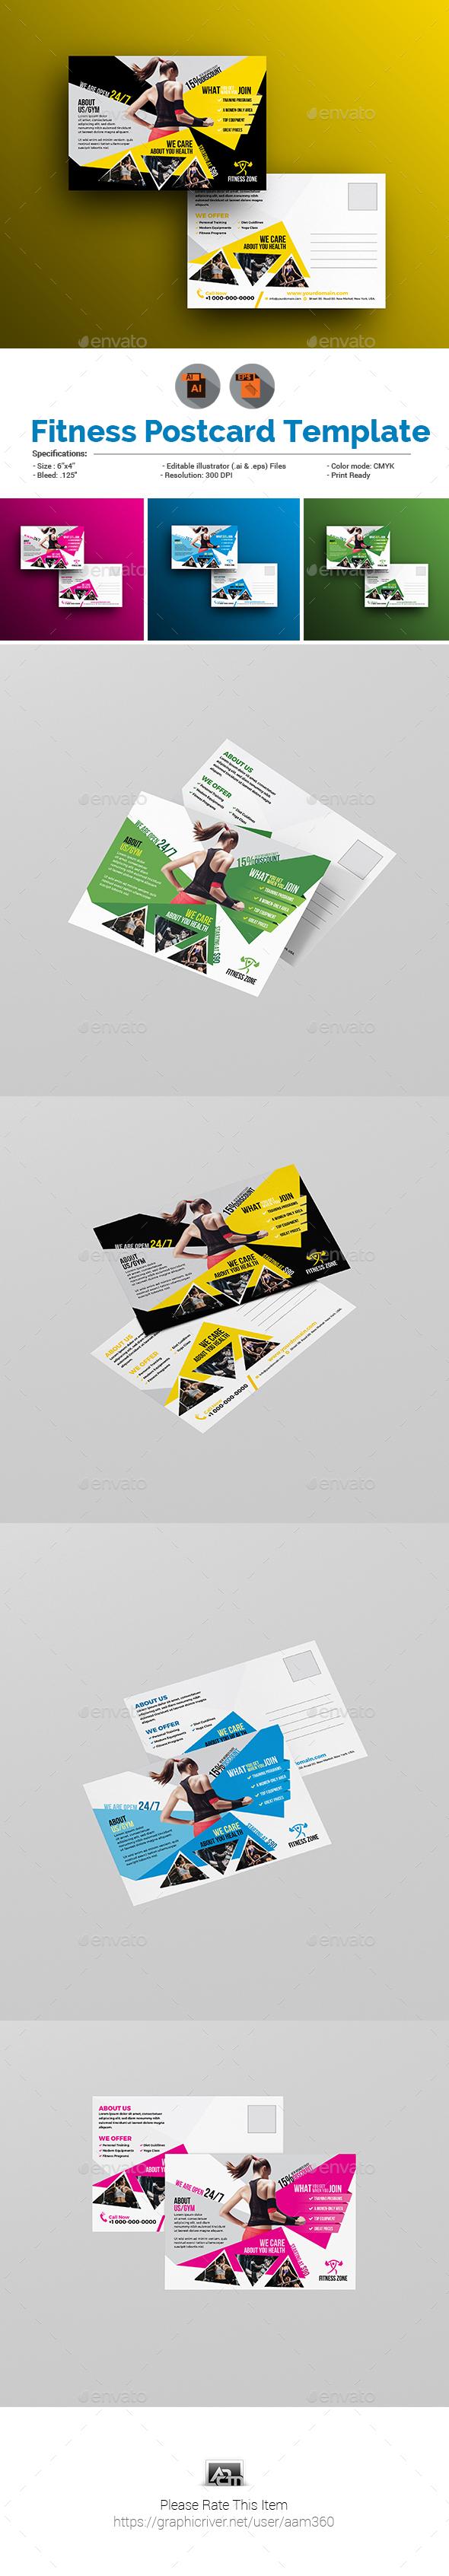 GraphicRiver Fitness Postcard Template 21058843